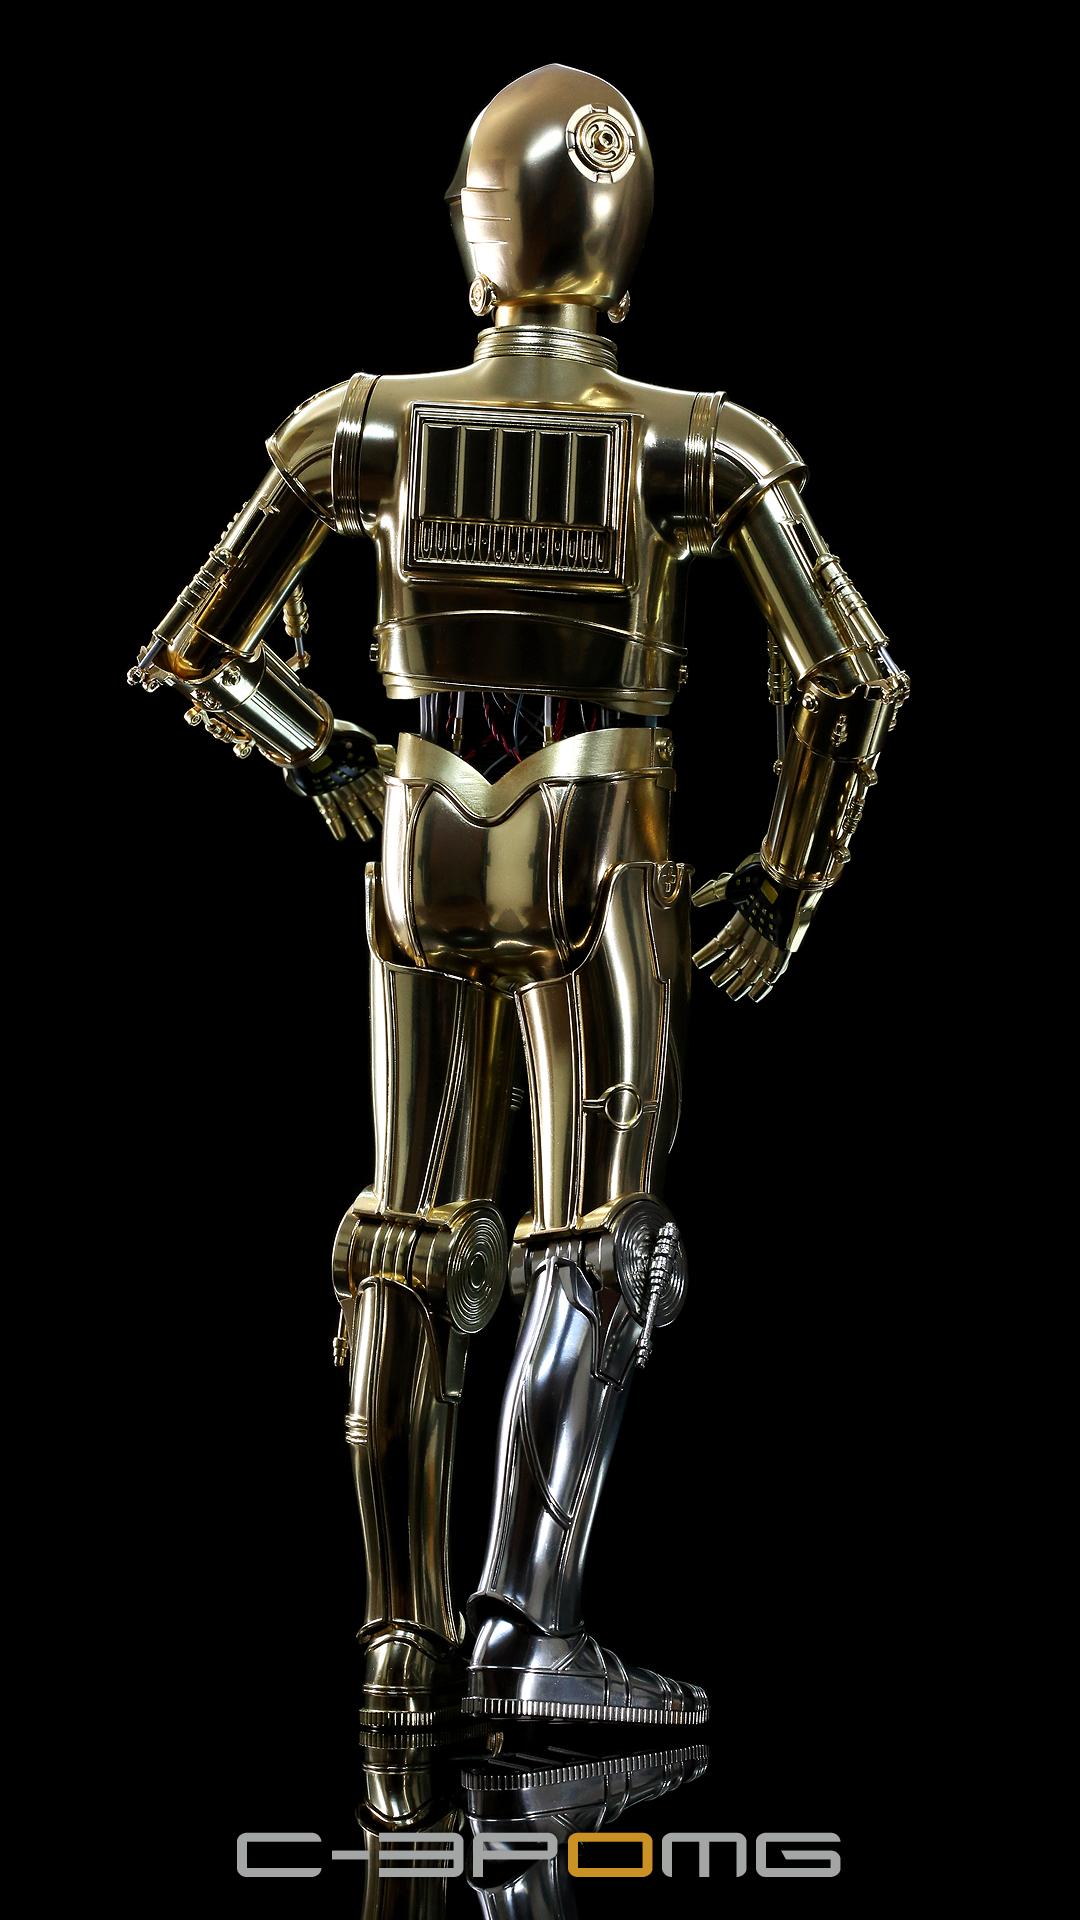 [Bandai] Star Wars: C-3PO - Perfect Model 1/6 scale - LANÇADO!!! - Página 2 C-3PO1203_zps54260c4c